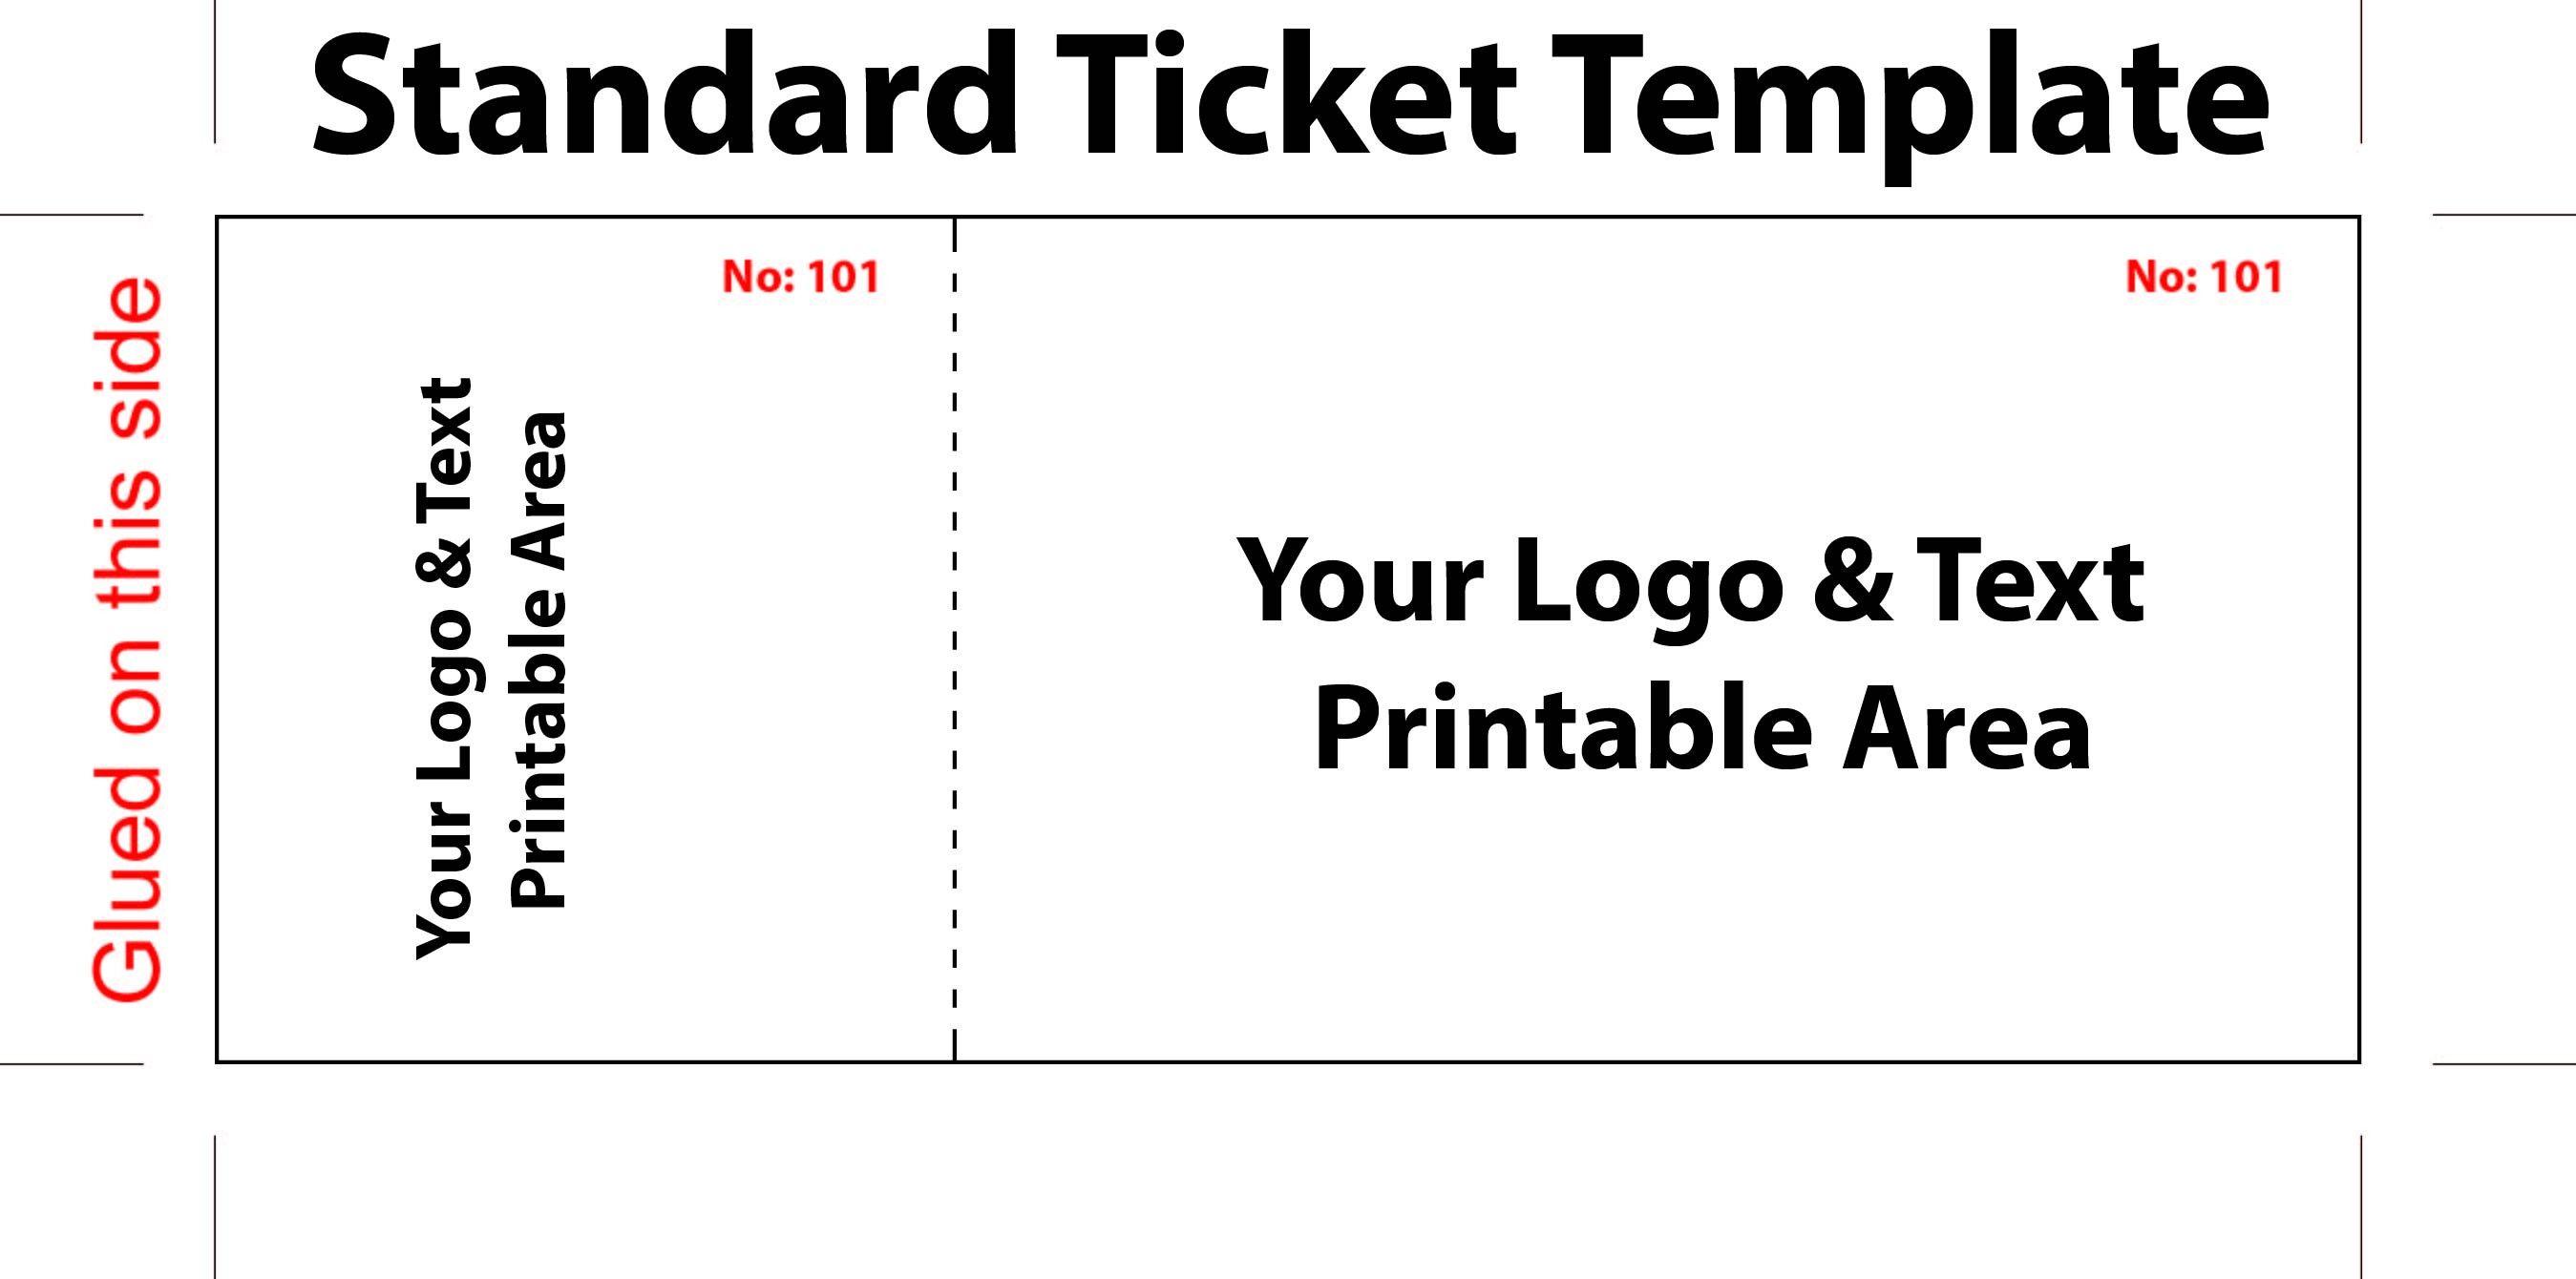 Sample Ticket Template